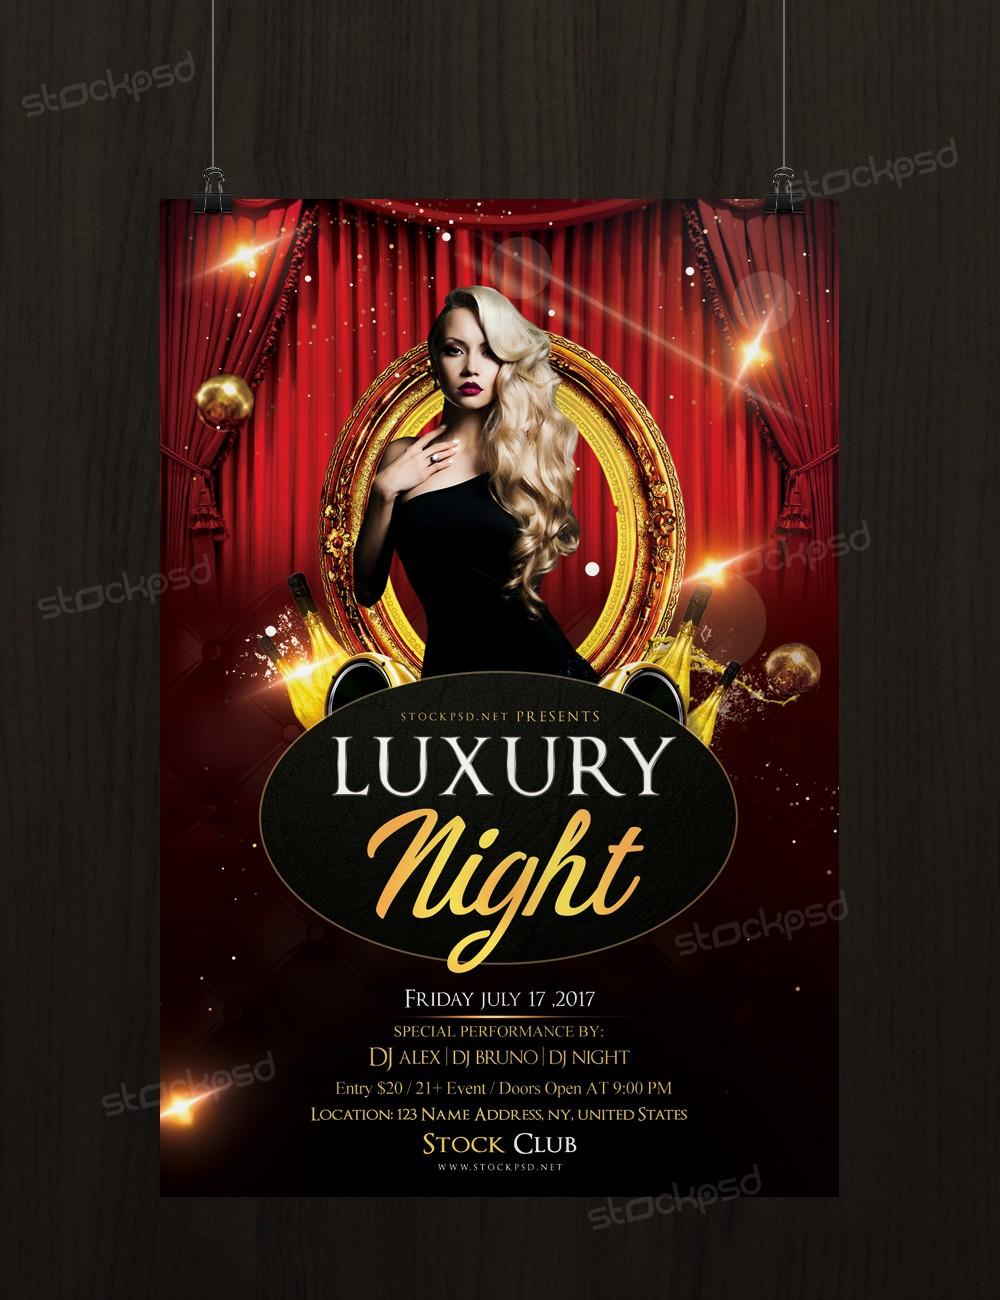 seasonal flyers psd flyer template stockpsd net luxury night psd flyer template